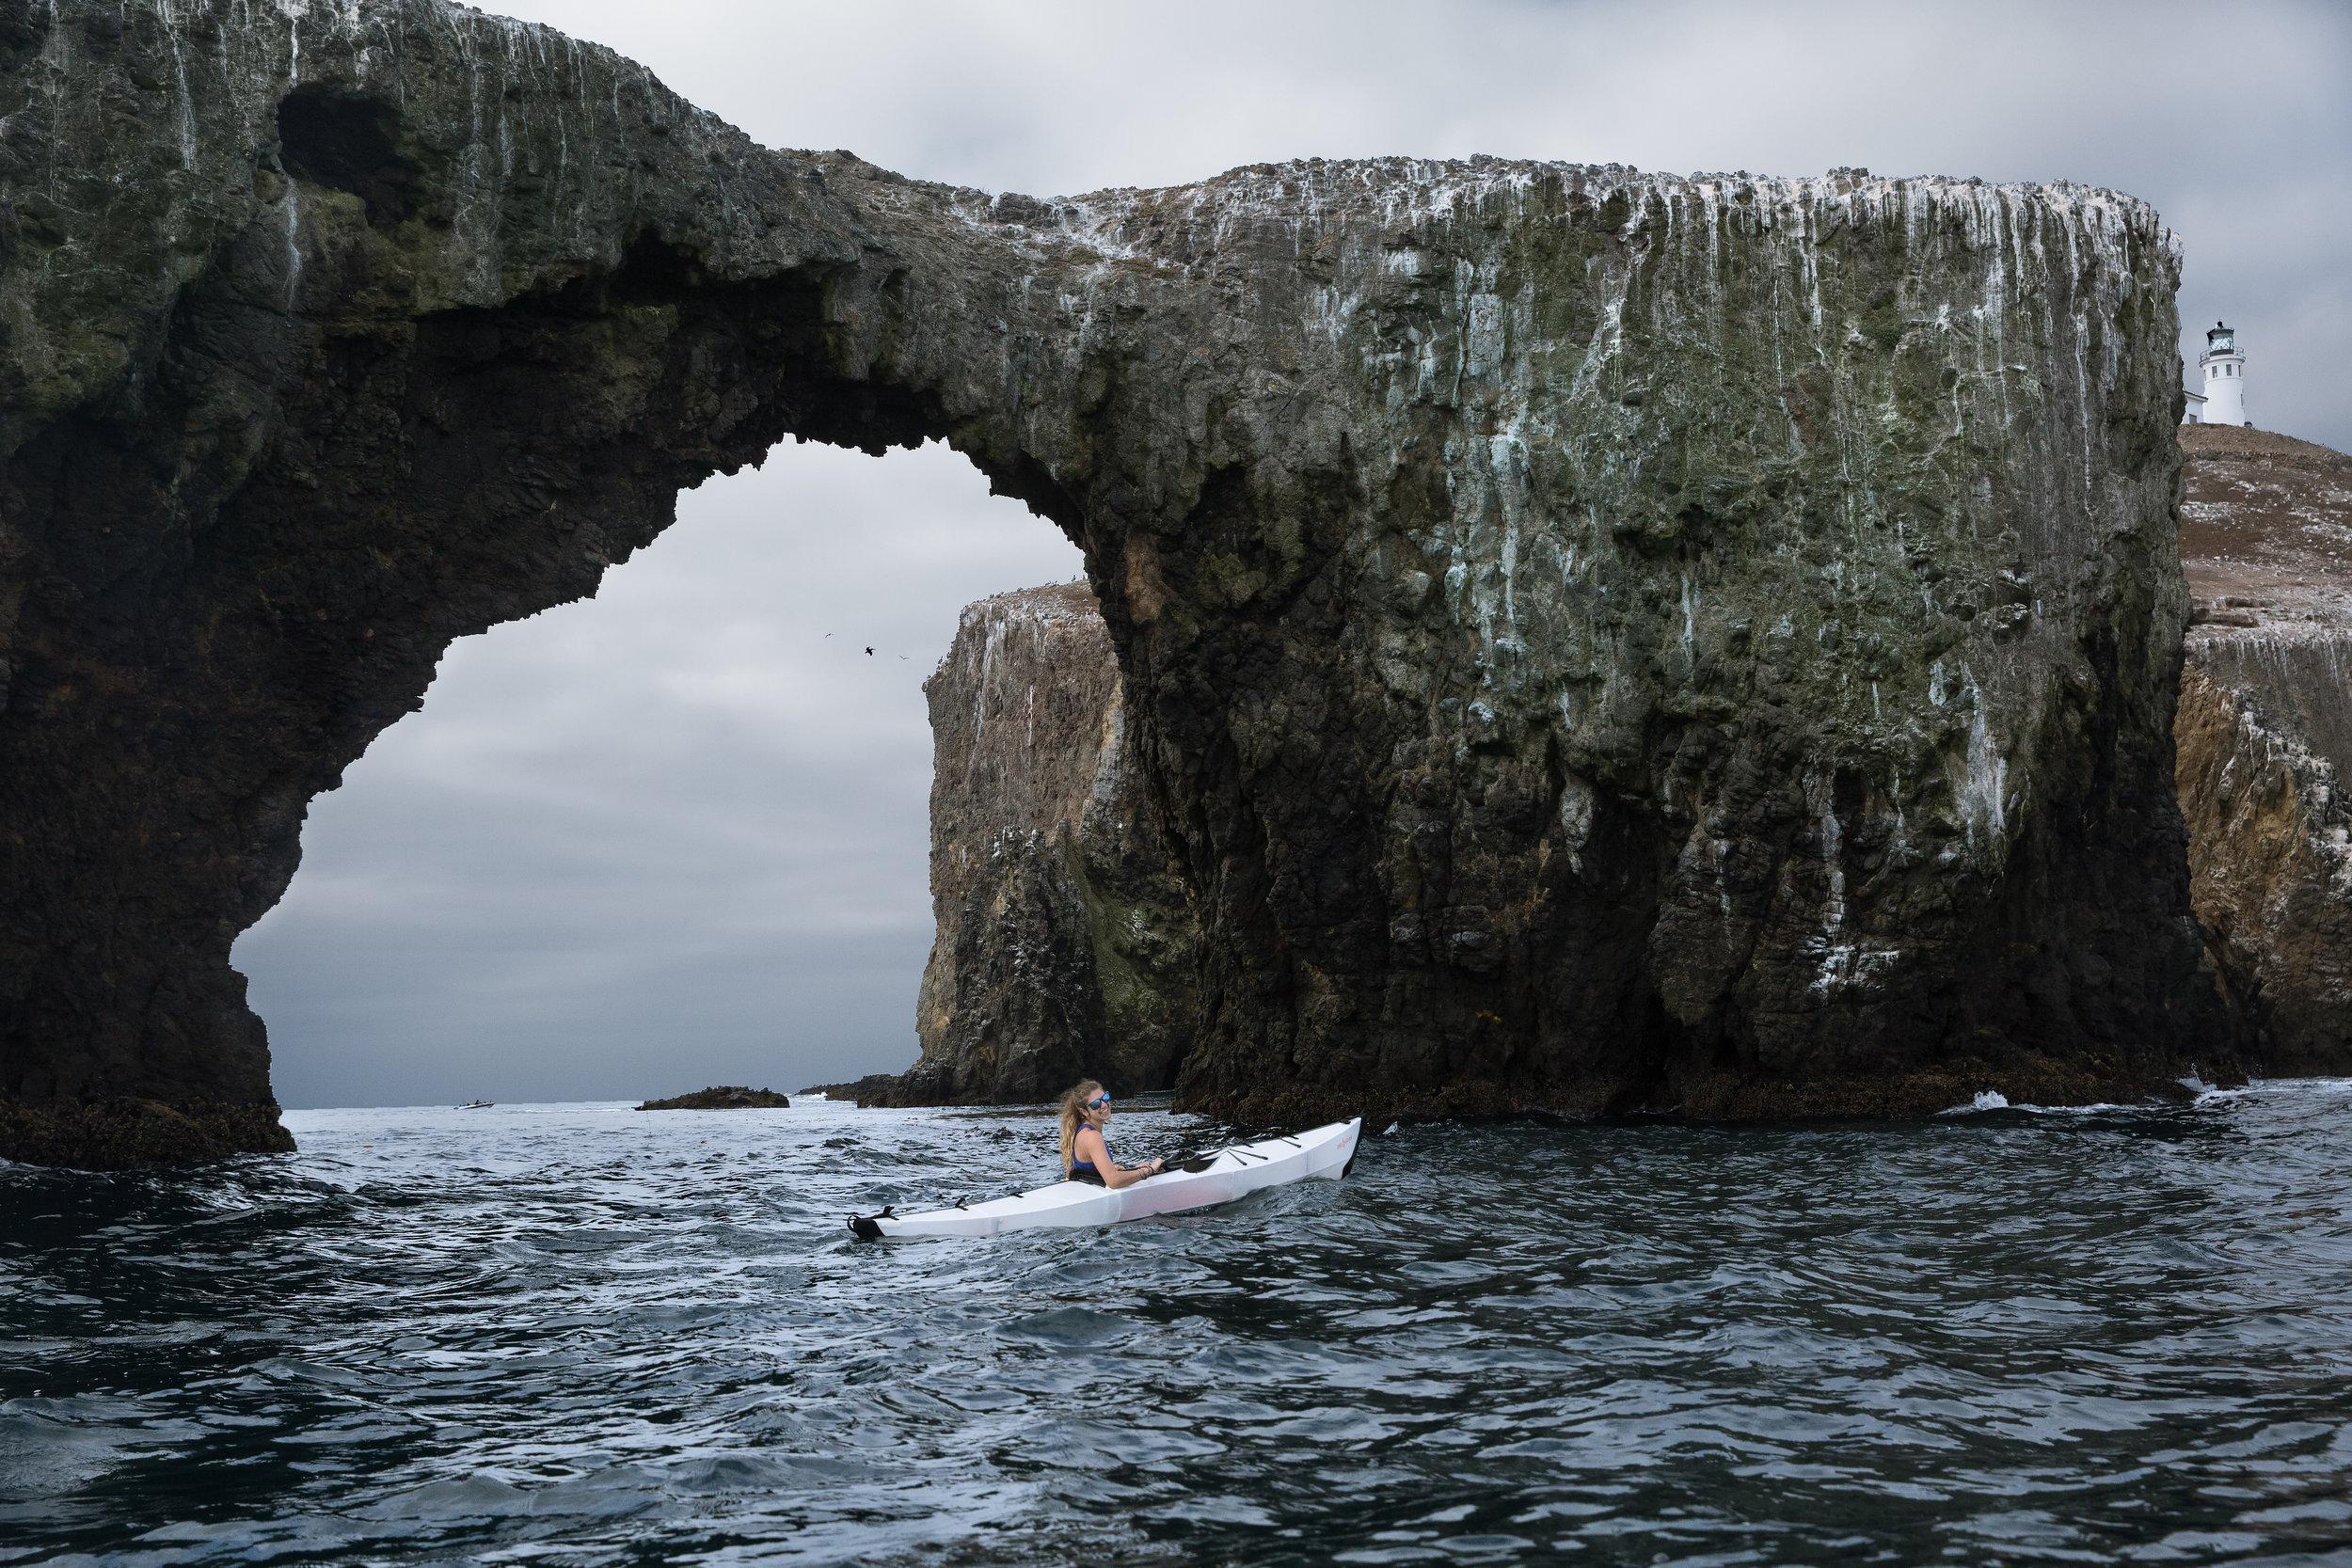 20170916-Anacapa Island REVO-14836-Edit.jpg